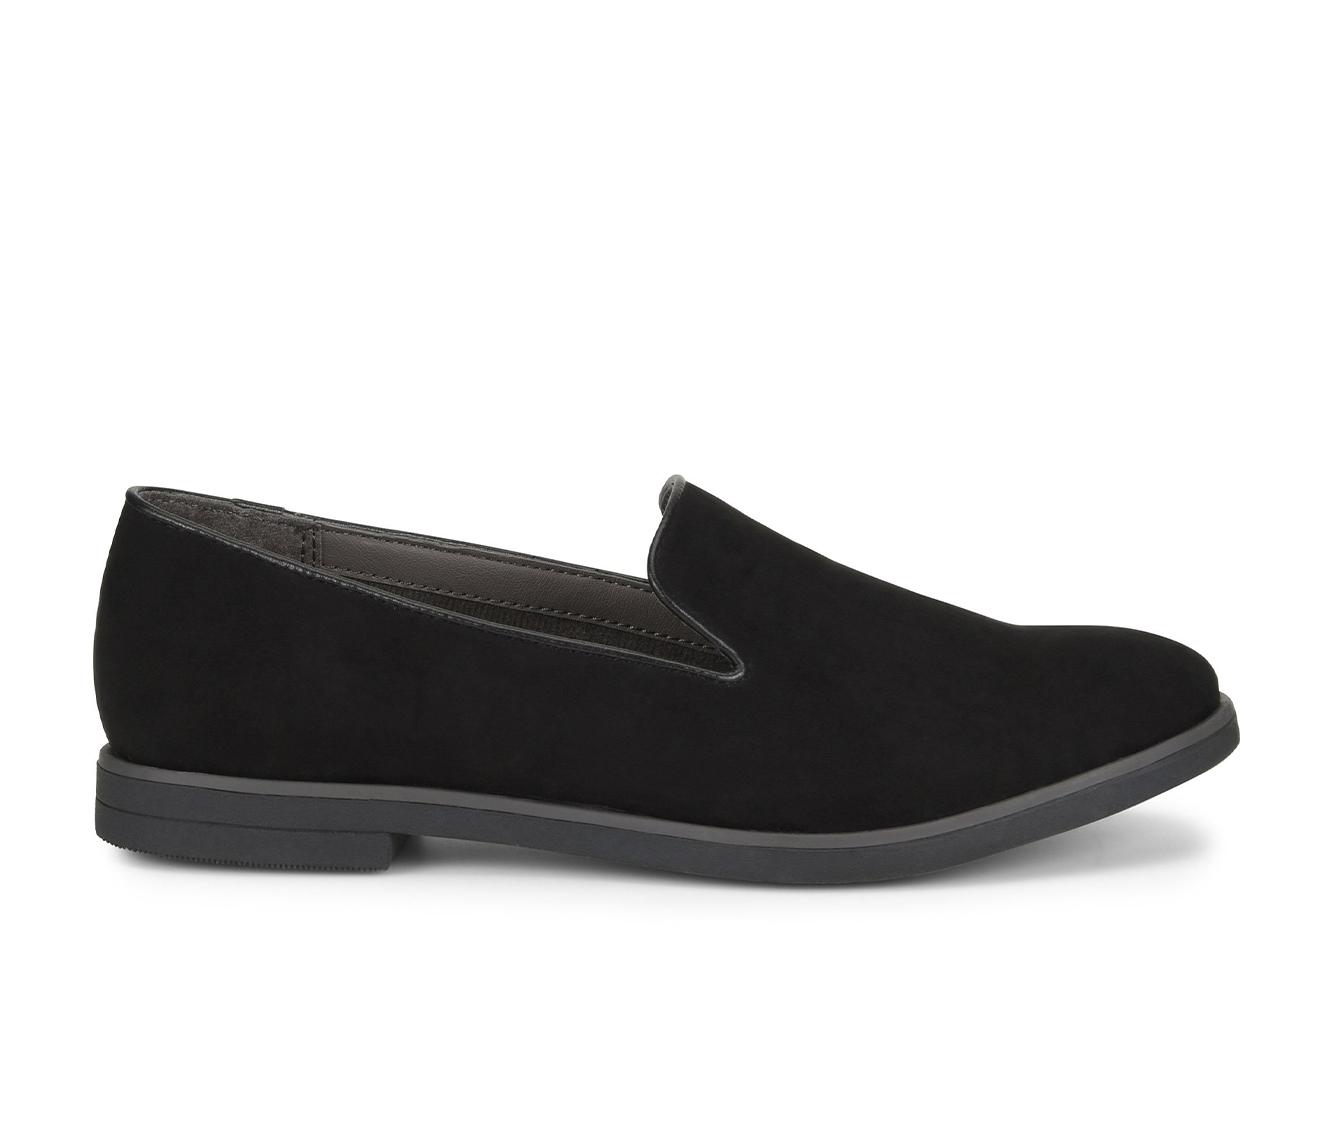 EuroSoft Vannah Women's Shoe (Black Canvas)